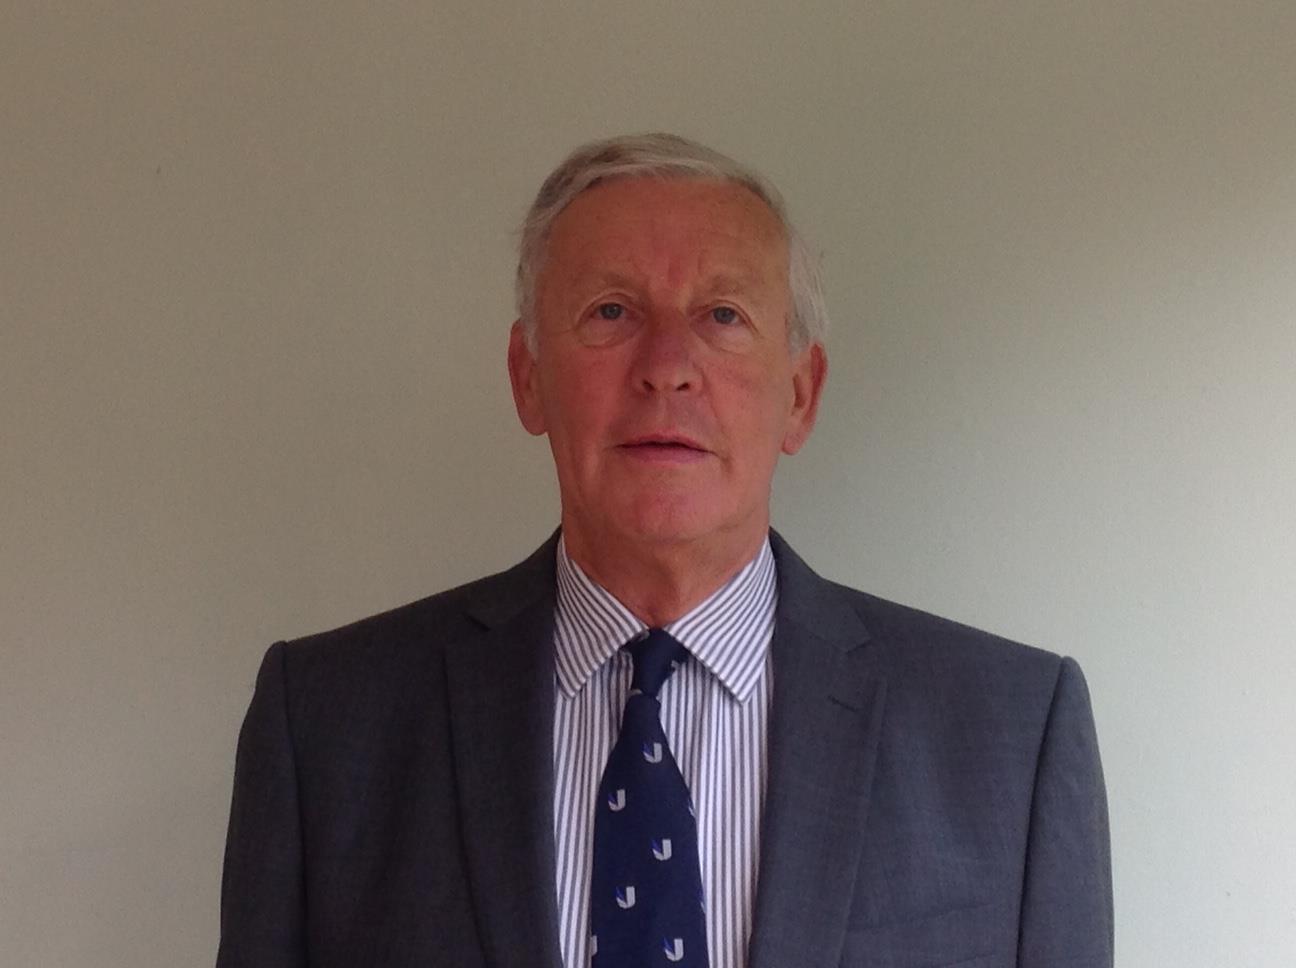 Mr Mike Bellamy